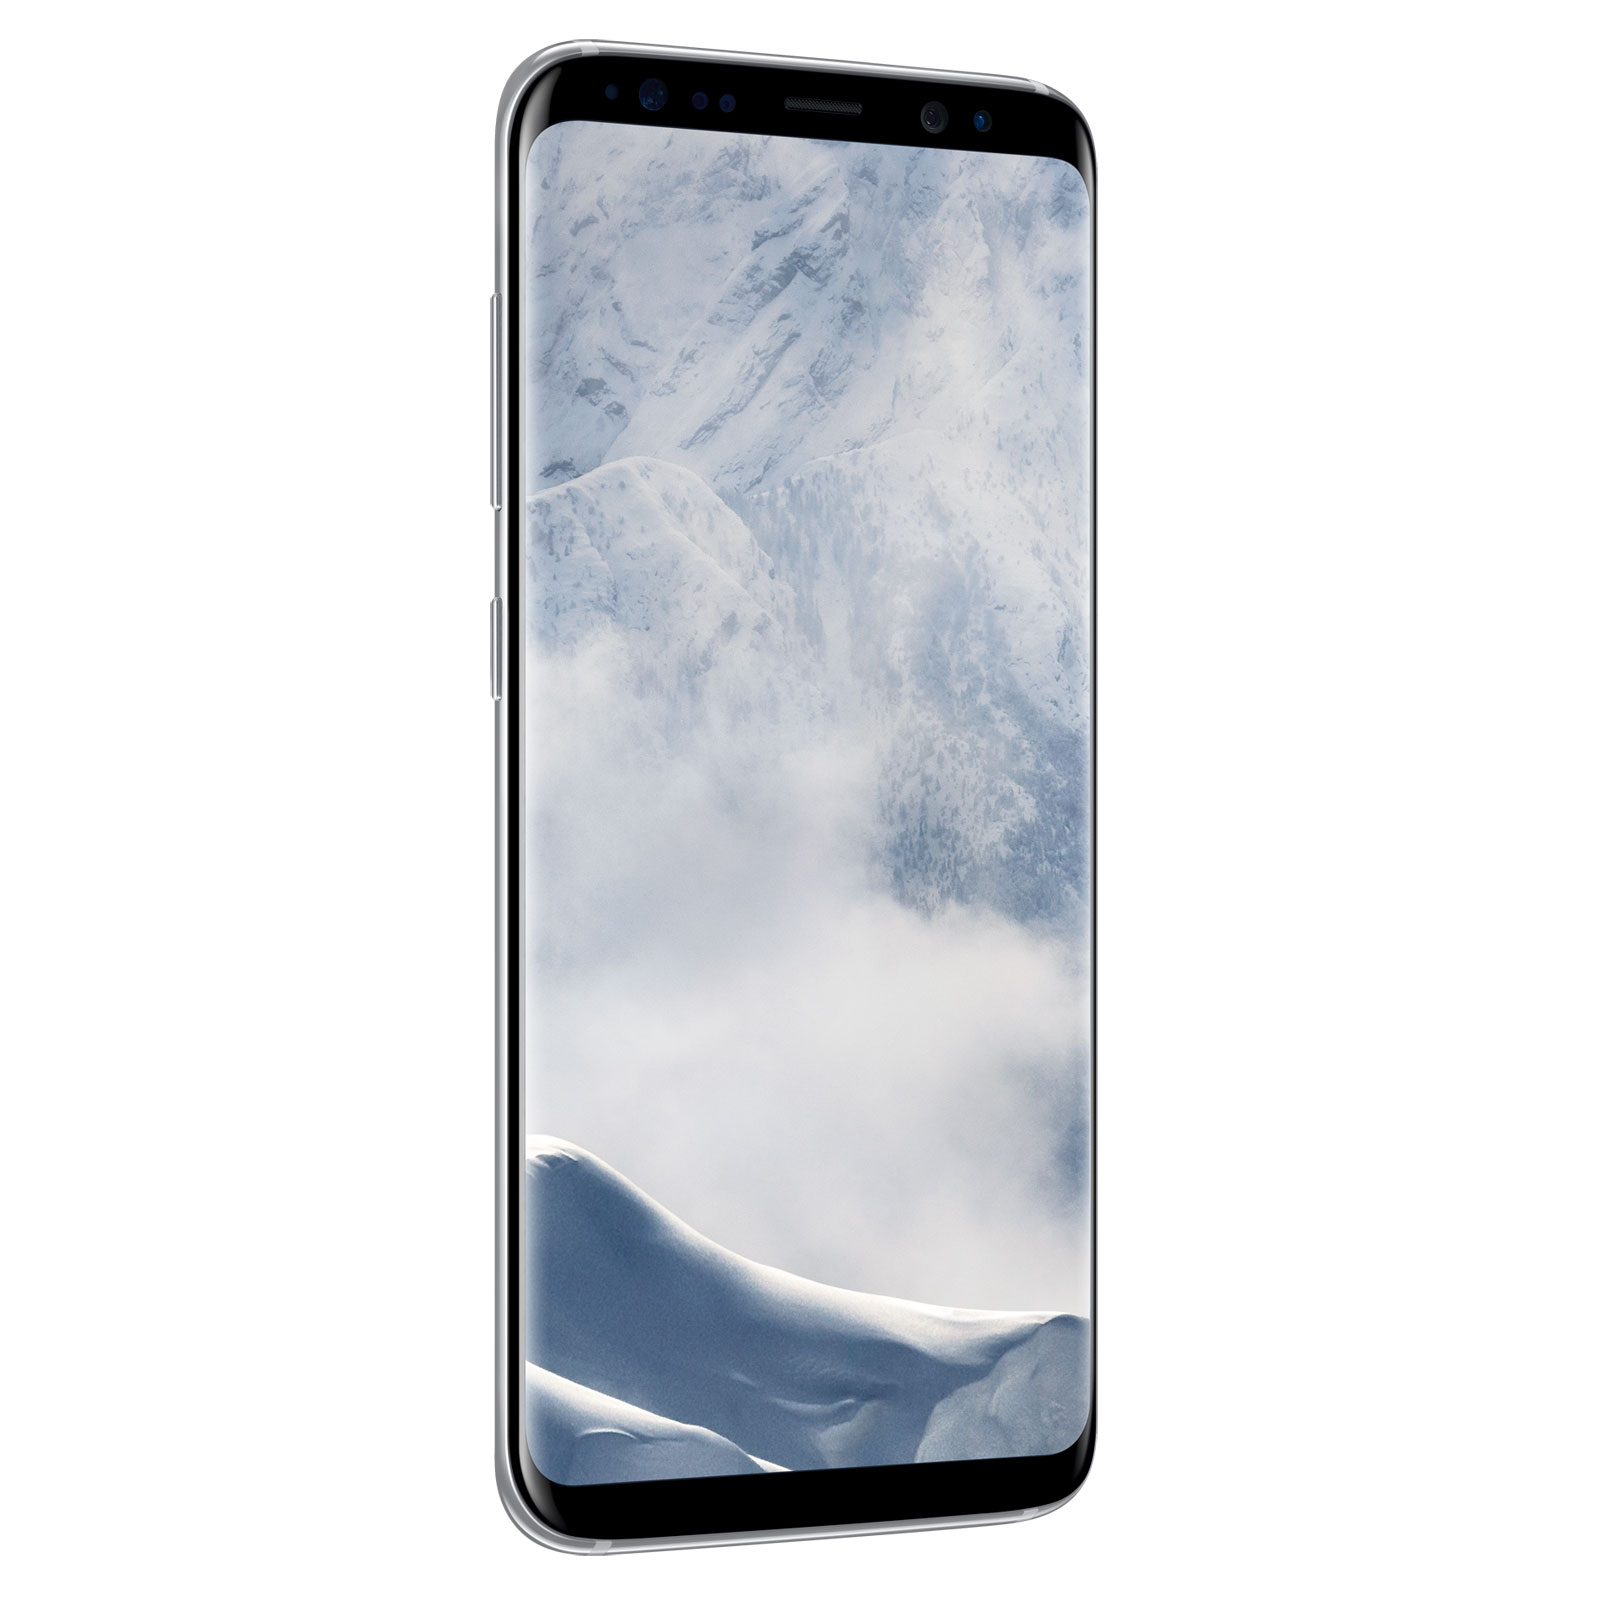 Samsung Galaxy S8 64Go G950 Artic Silver - Téléphonie Samsung - 4